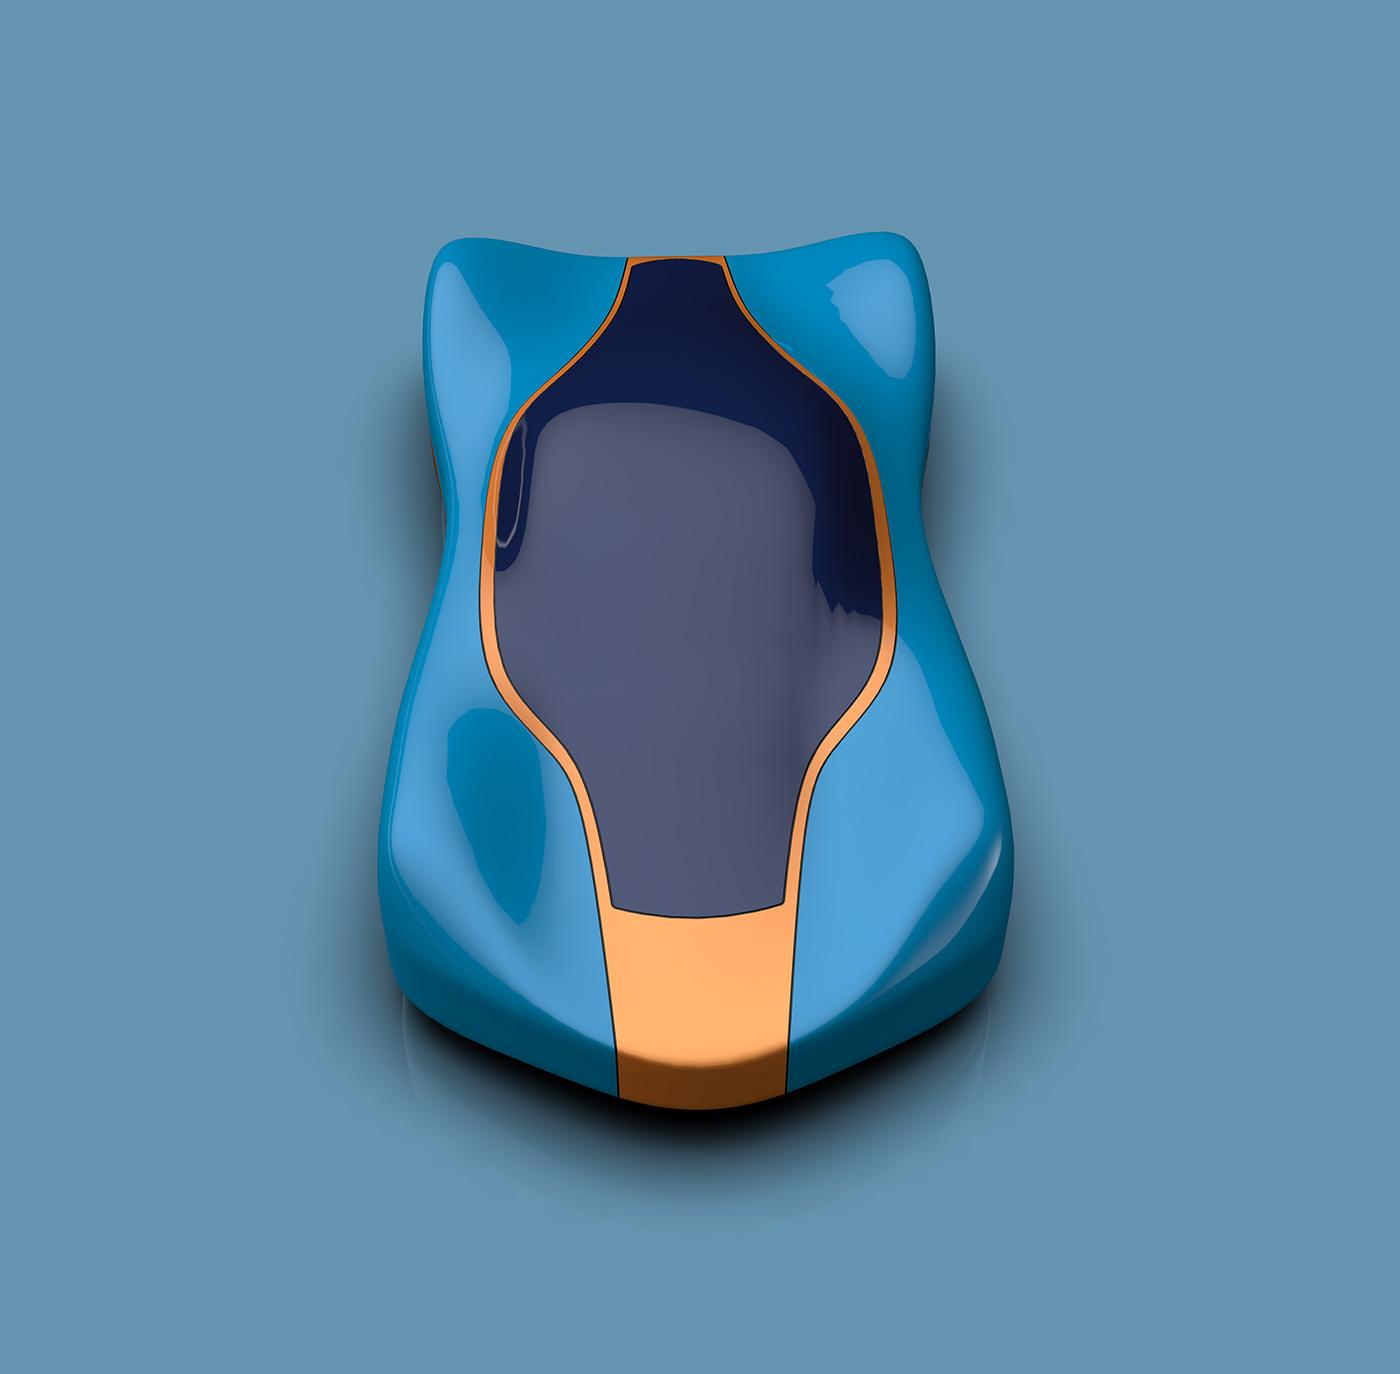 art automotive   Digital Art  digital sculpture fine art Form formstudy organic sculpture shape